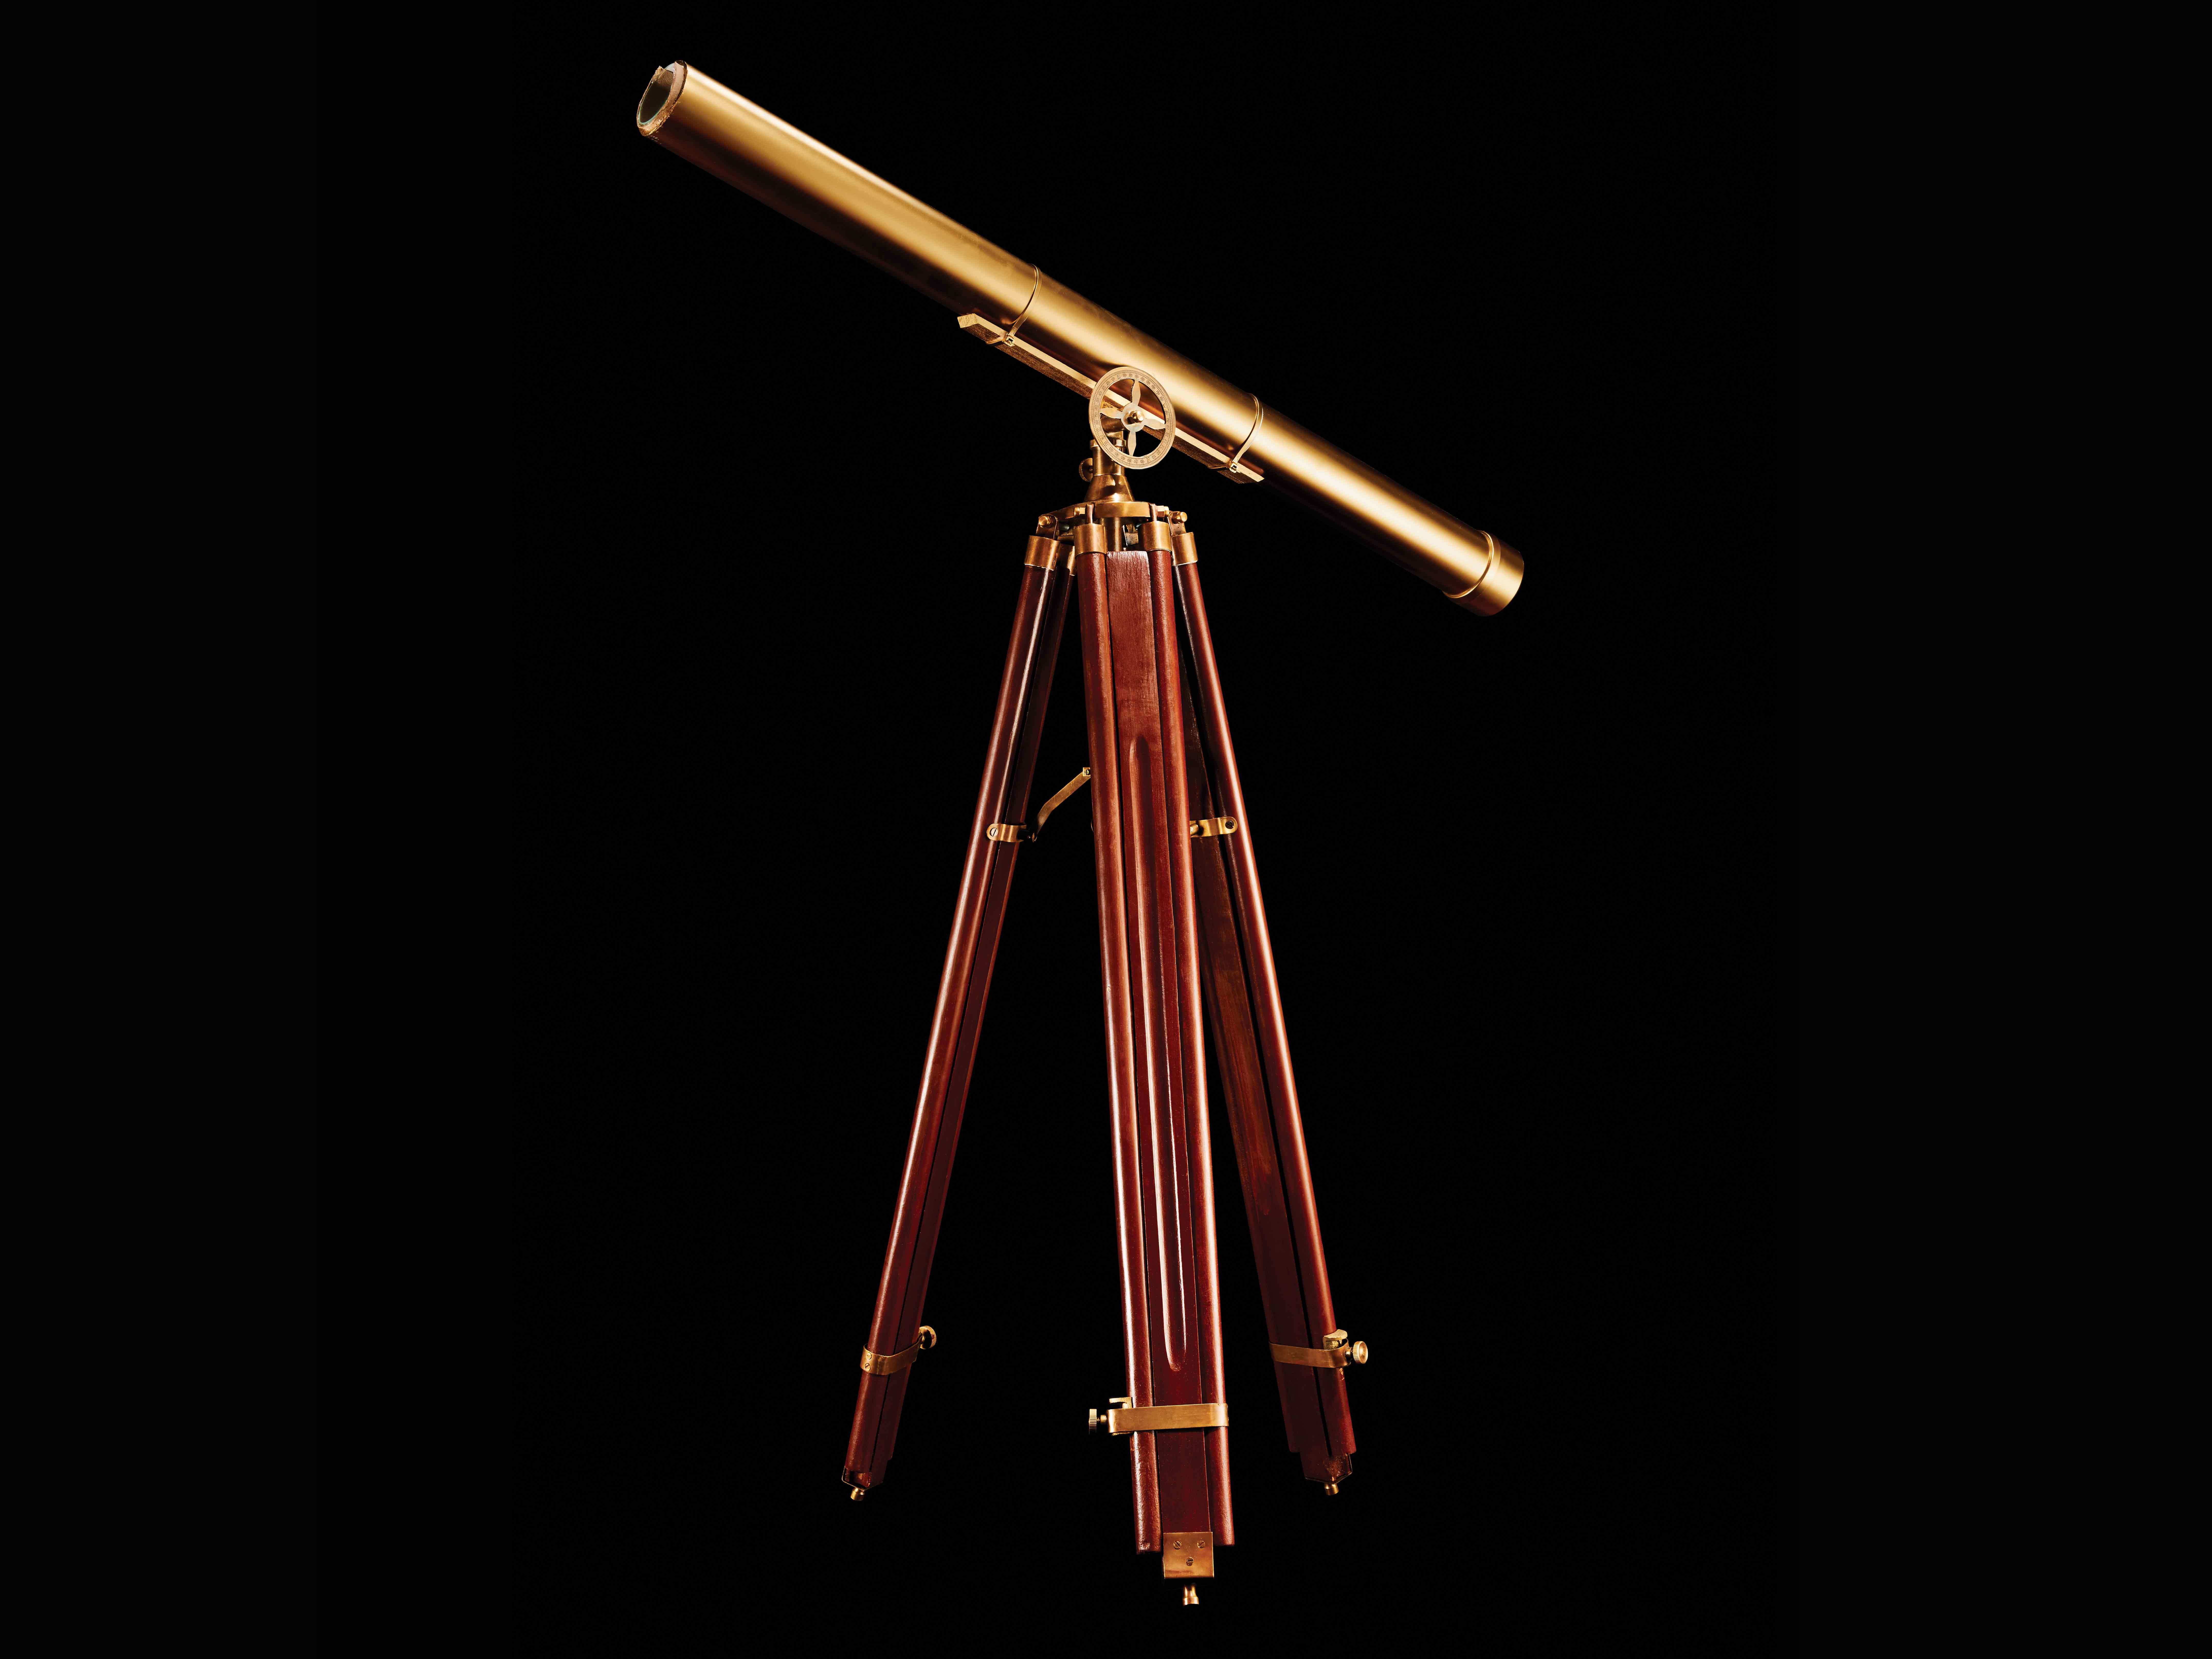 A DIY version of Galileo's telescope